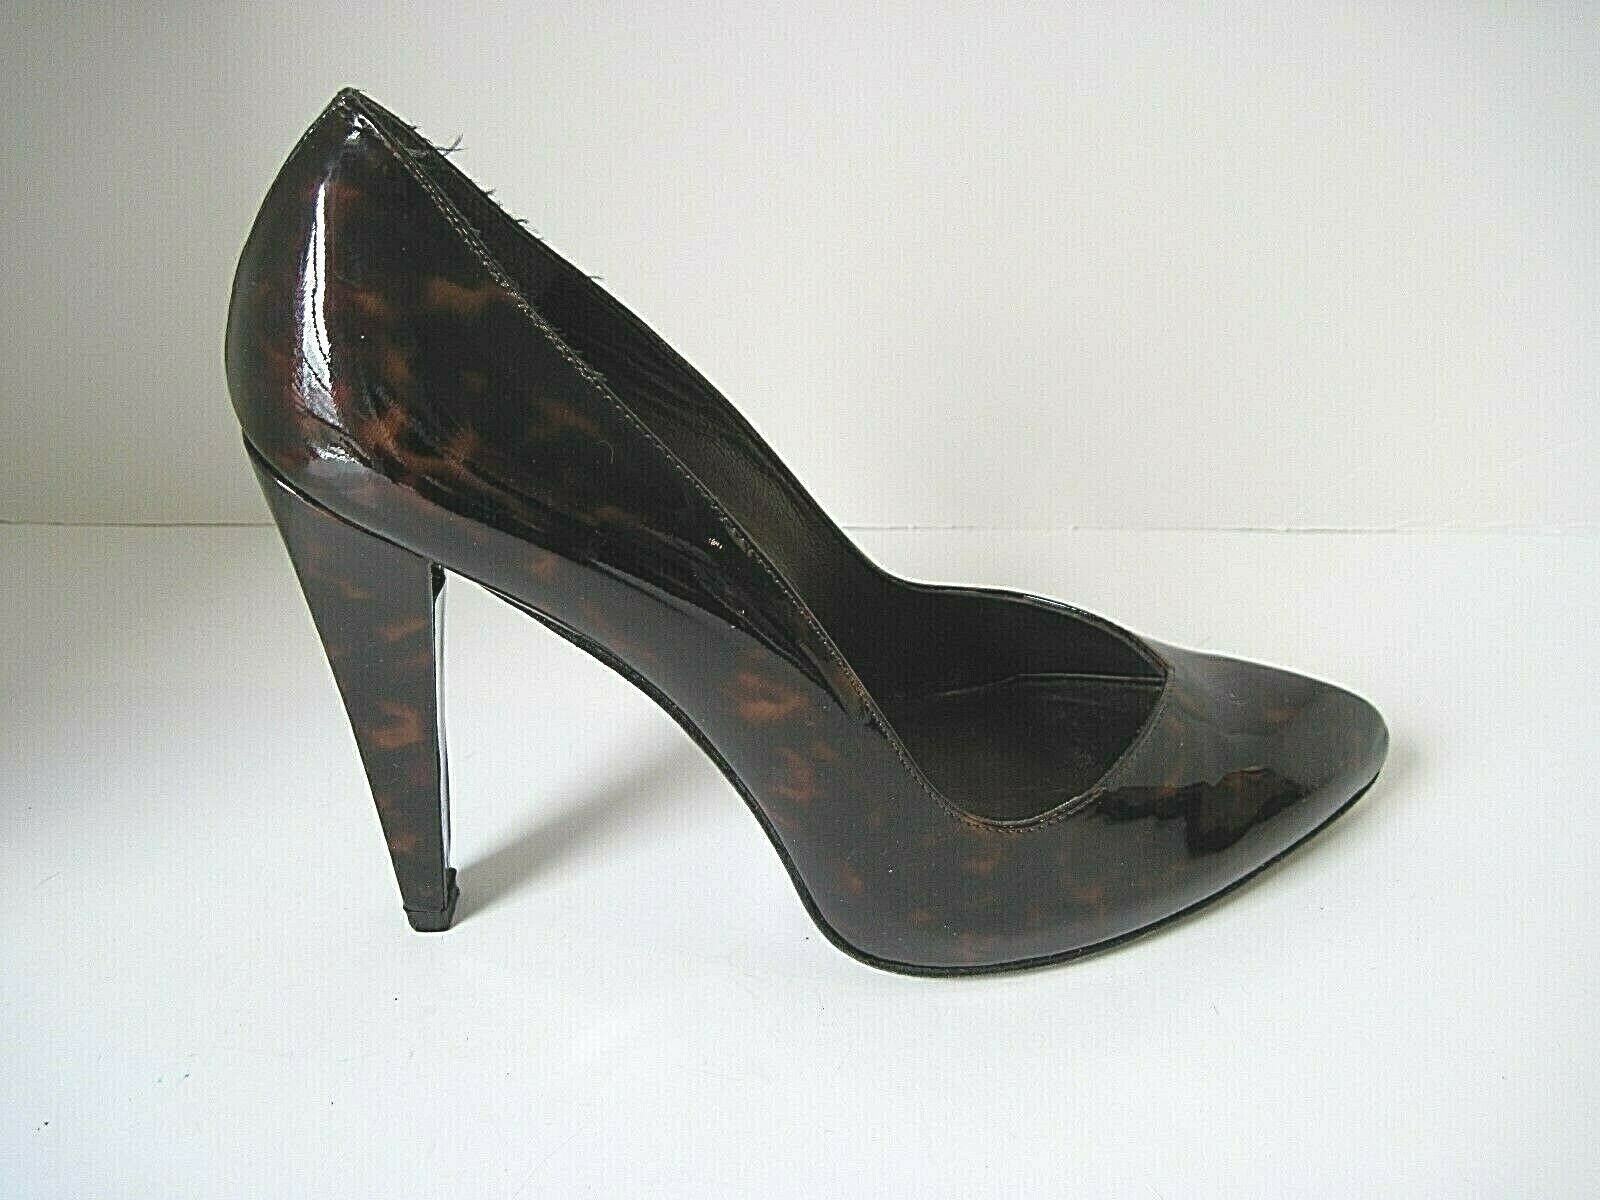 Stuart Weitzman Tortoise Patent Leather Pumps Heels Size 8 1 2 M